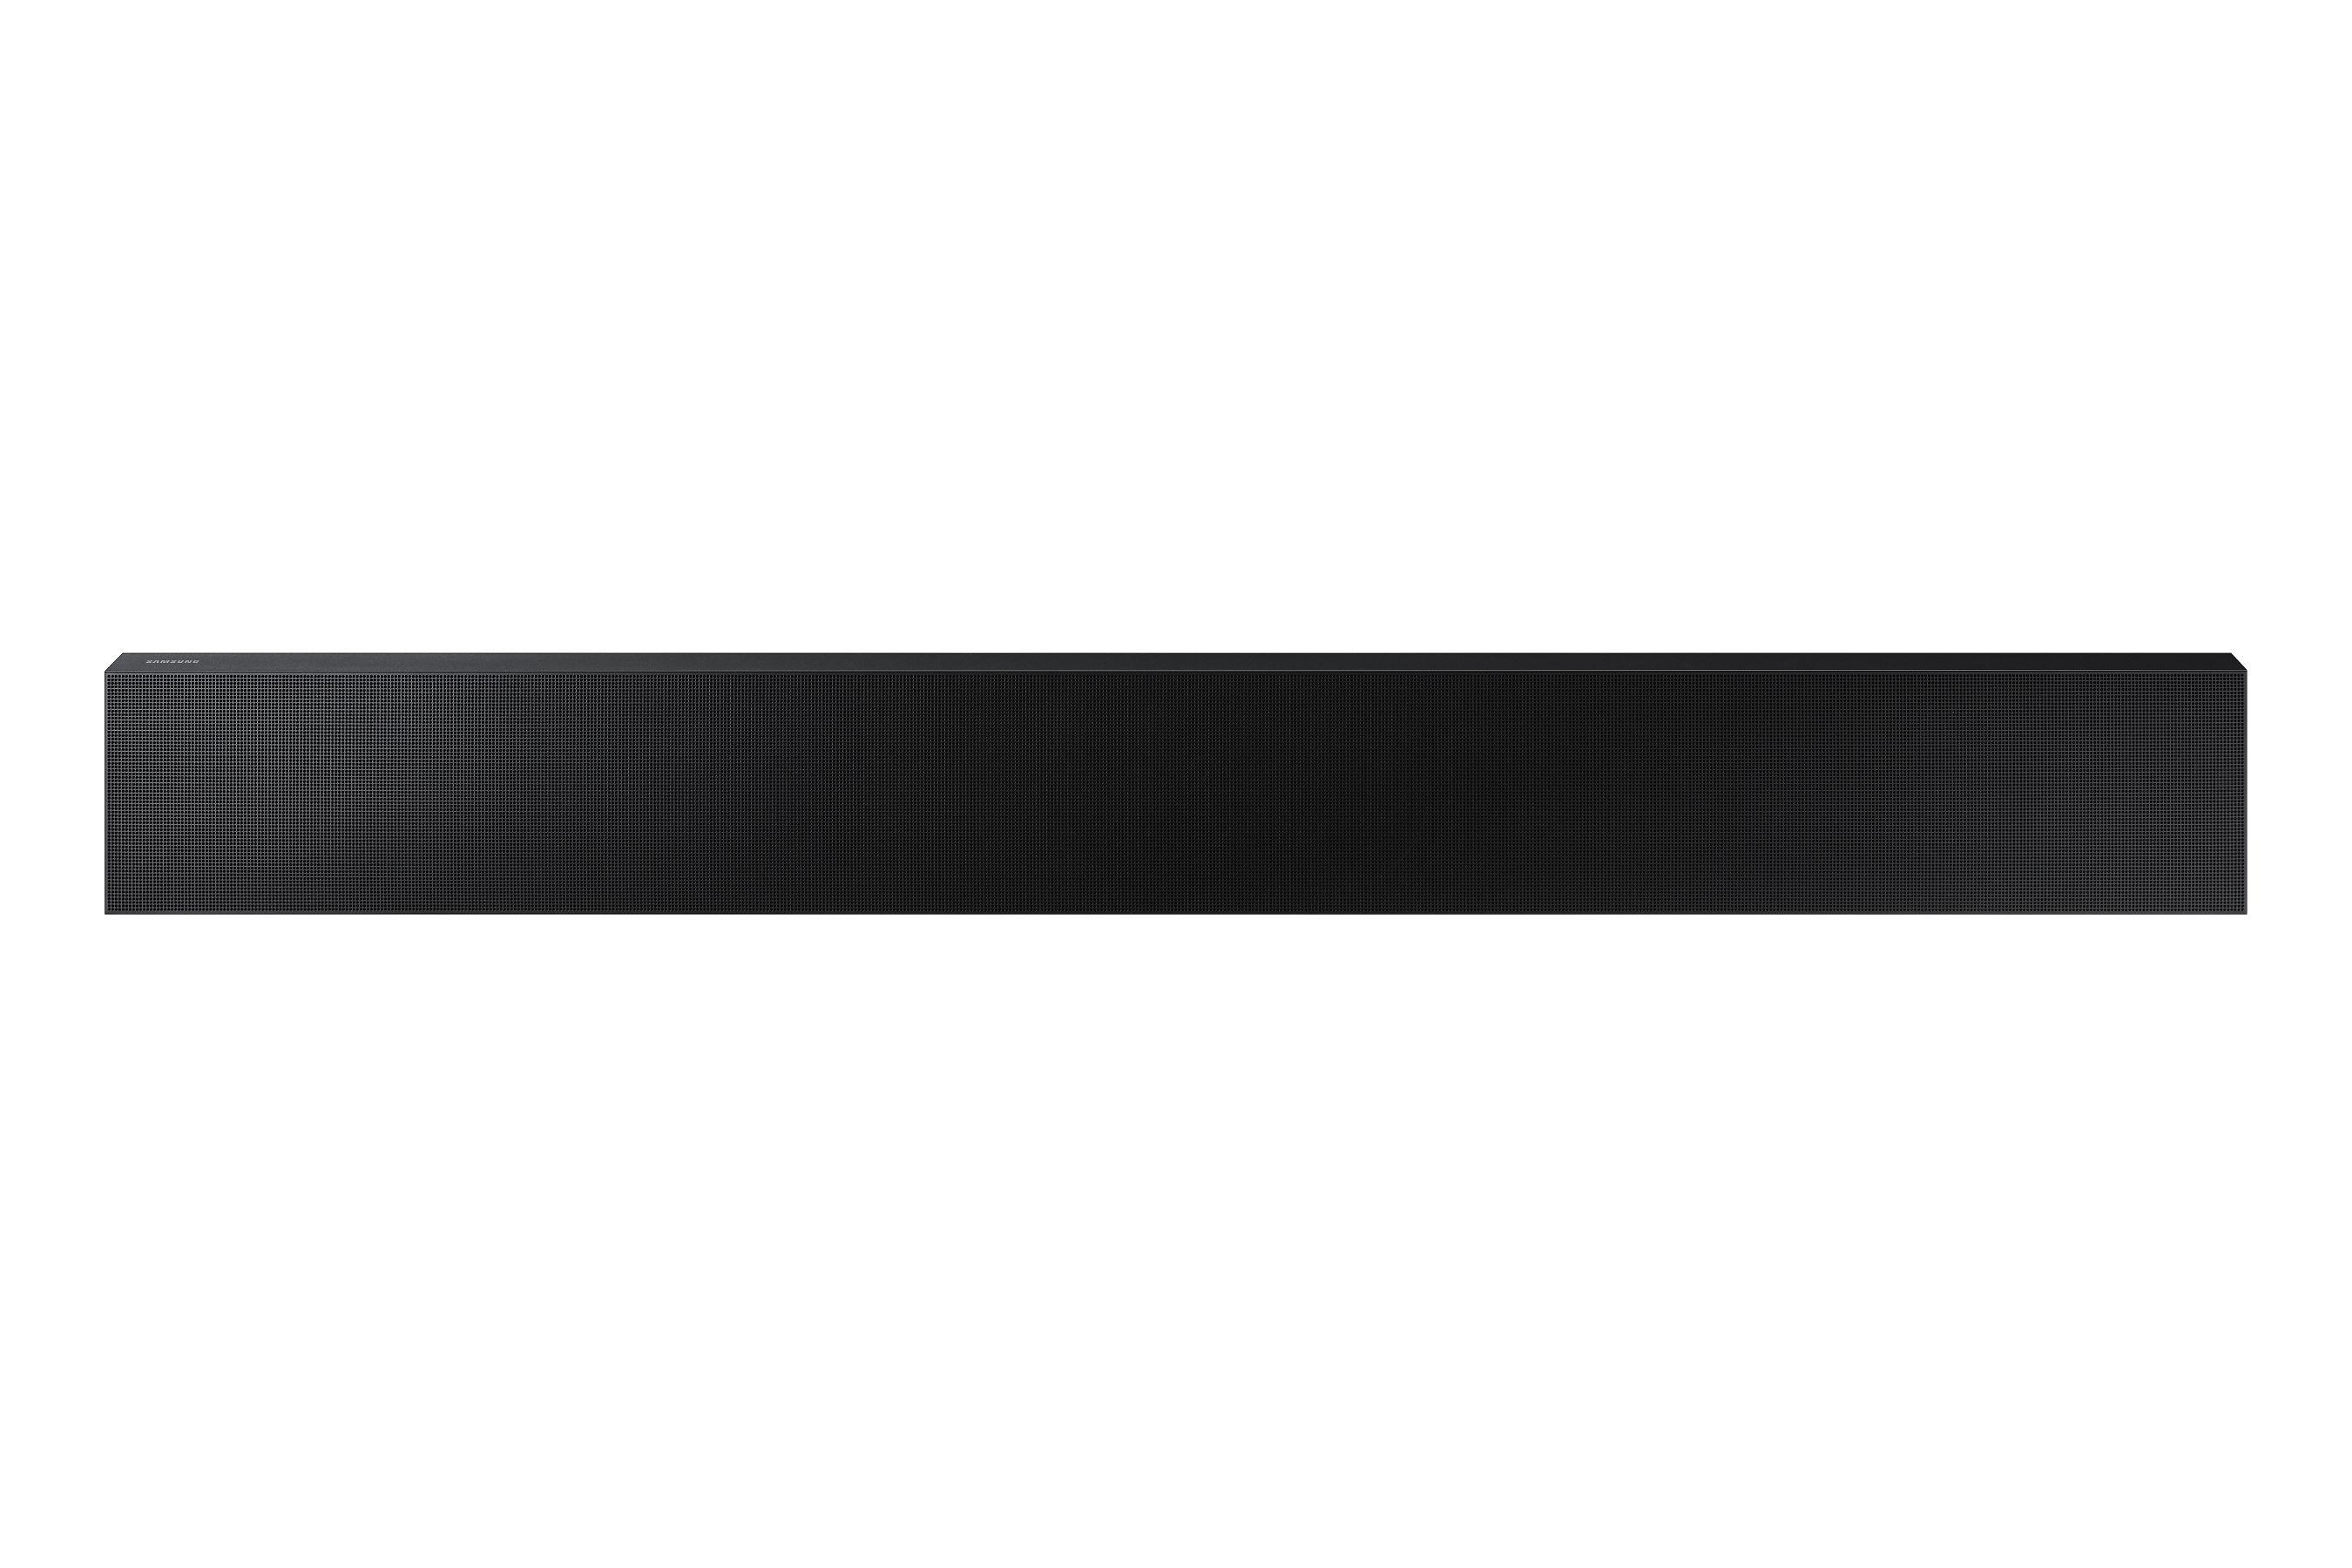 Samsung TheTerrace Soundbar HW-LST70T (2021)